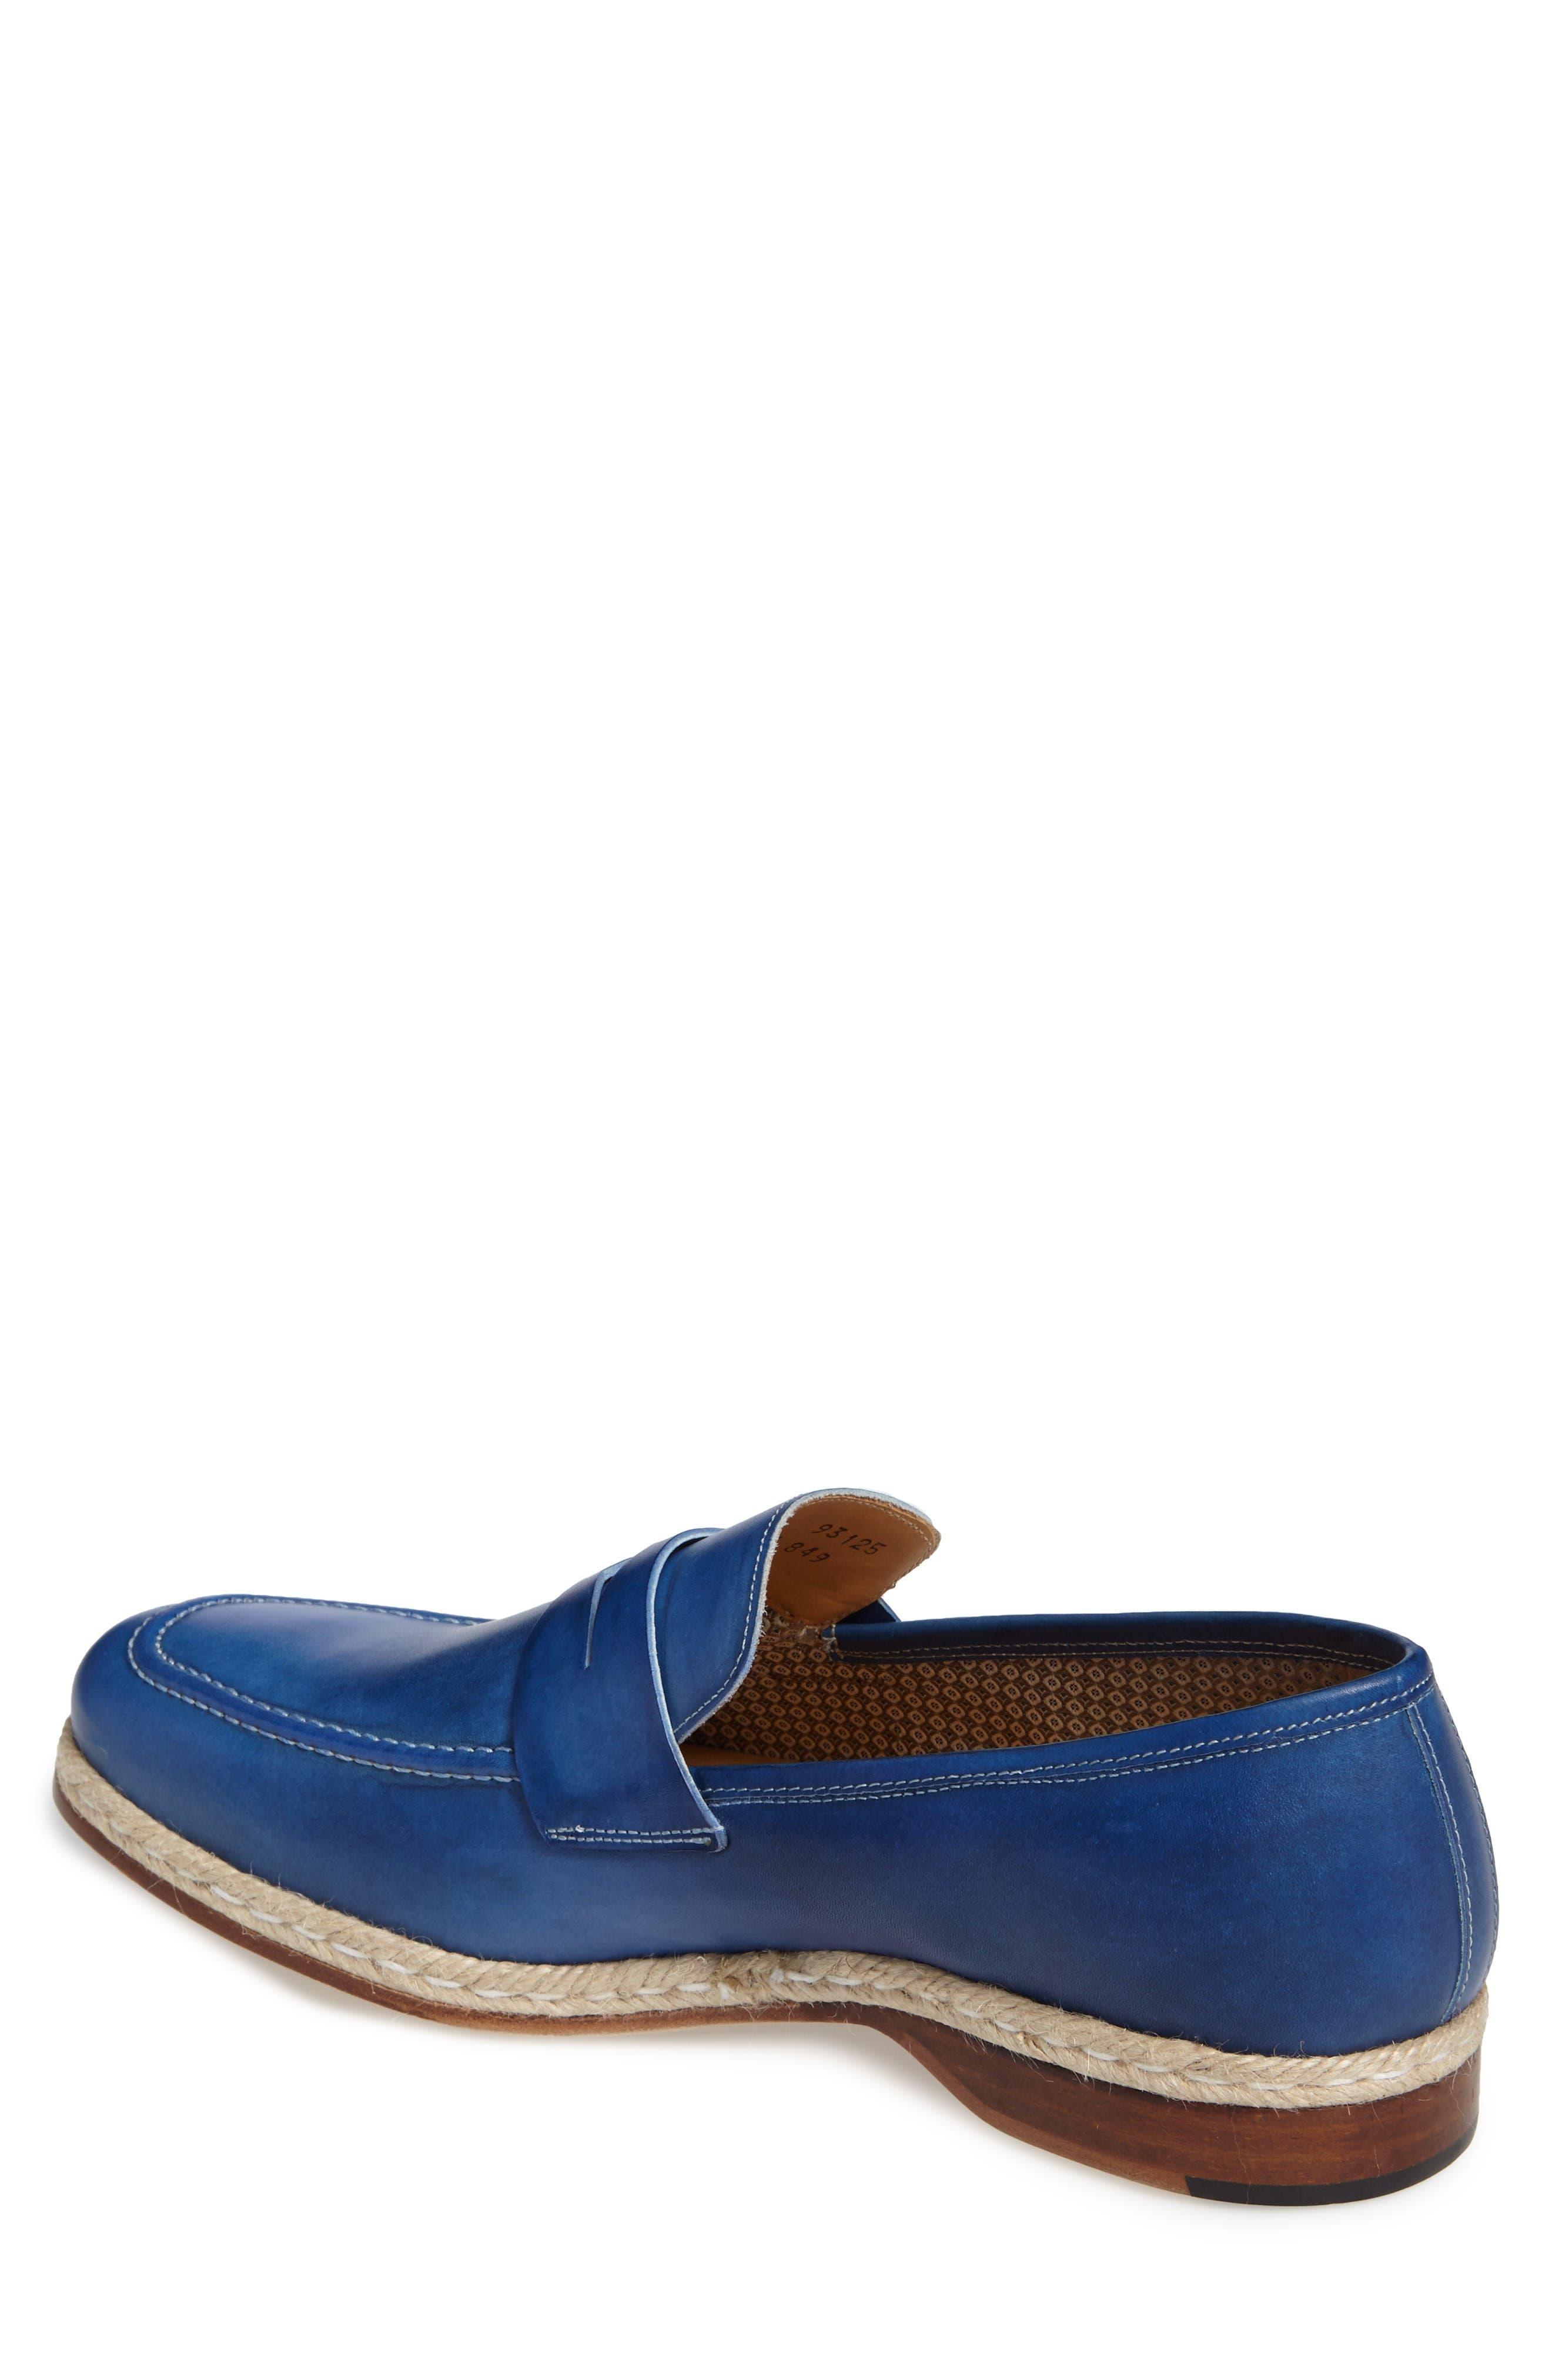 Battani Penny Loafer,                             Alternate thumbnail 2, color,                             Blue Leather